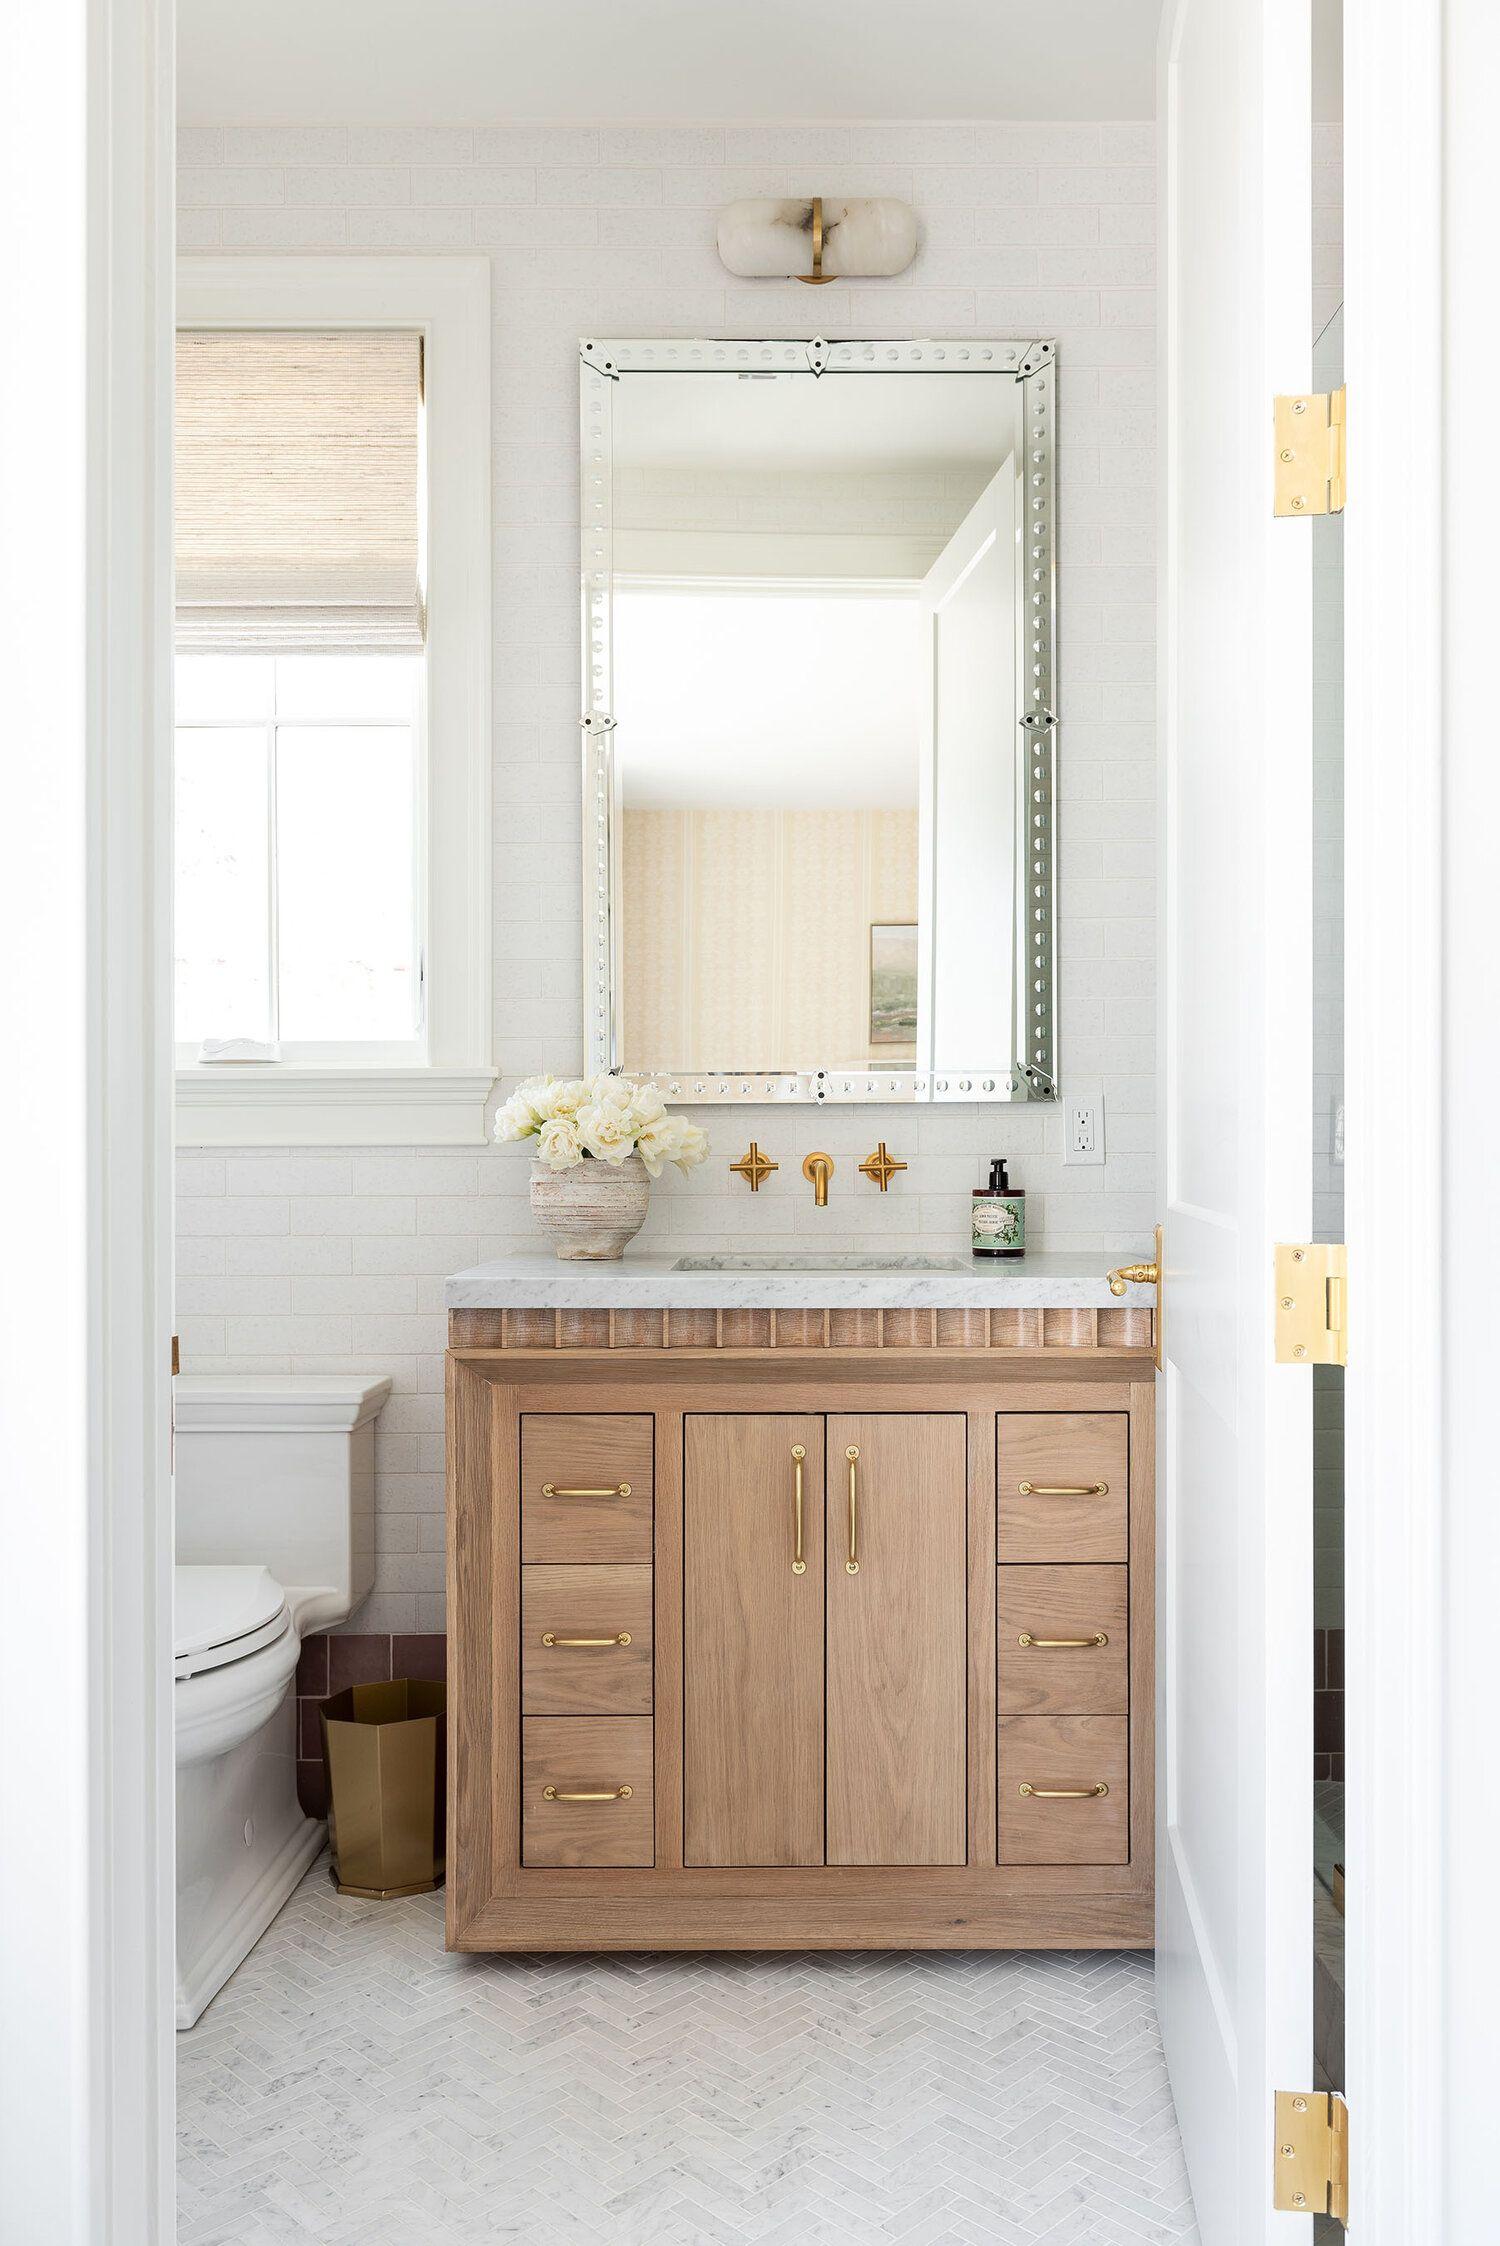 The Mcgee Home Wren S Room Photo Tour Studio Mcgee Bathroom Decor Small Bathroom Bathroom Inspiration